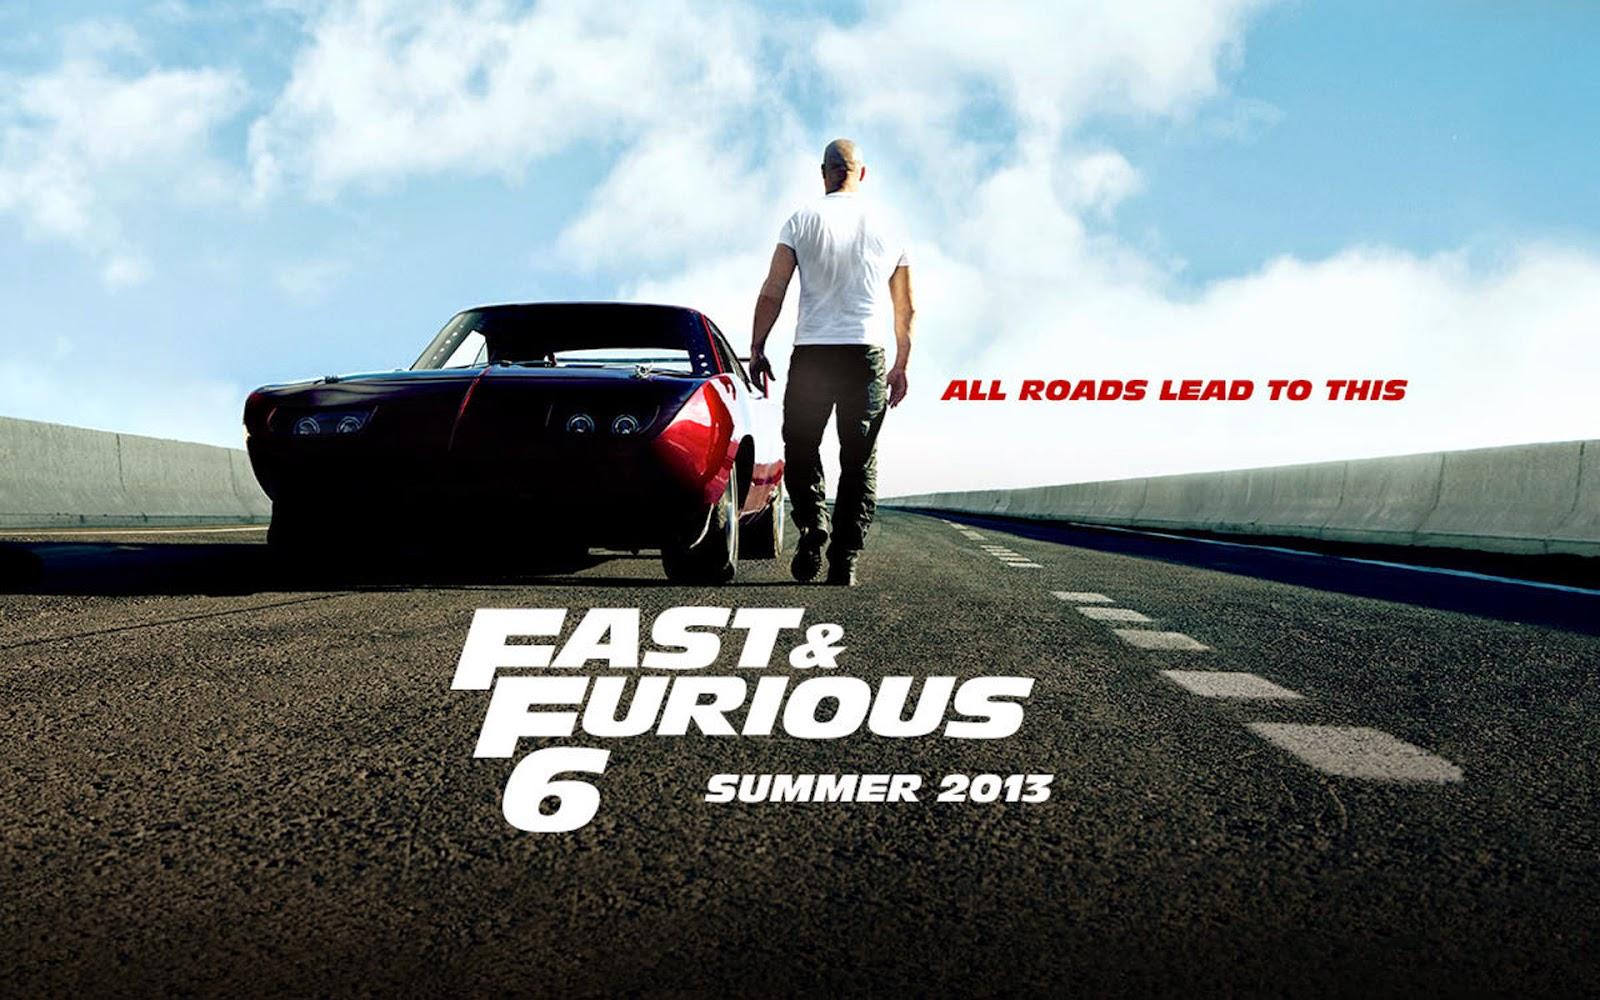 "<img src=""http://4.bp.blogspot.com/-ec4B0YbaWDw/U8QlkISQzvI/AAAAAAAALrU/Lo_8Rr406Oo/s1600/fast-and_furious-6-hd-wallpaper.jpg"" alt=""Fast and Furious 6 HD Wallpaper"" />"